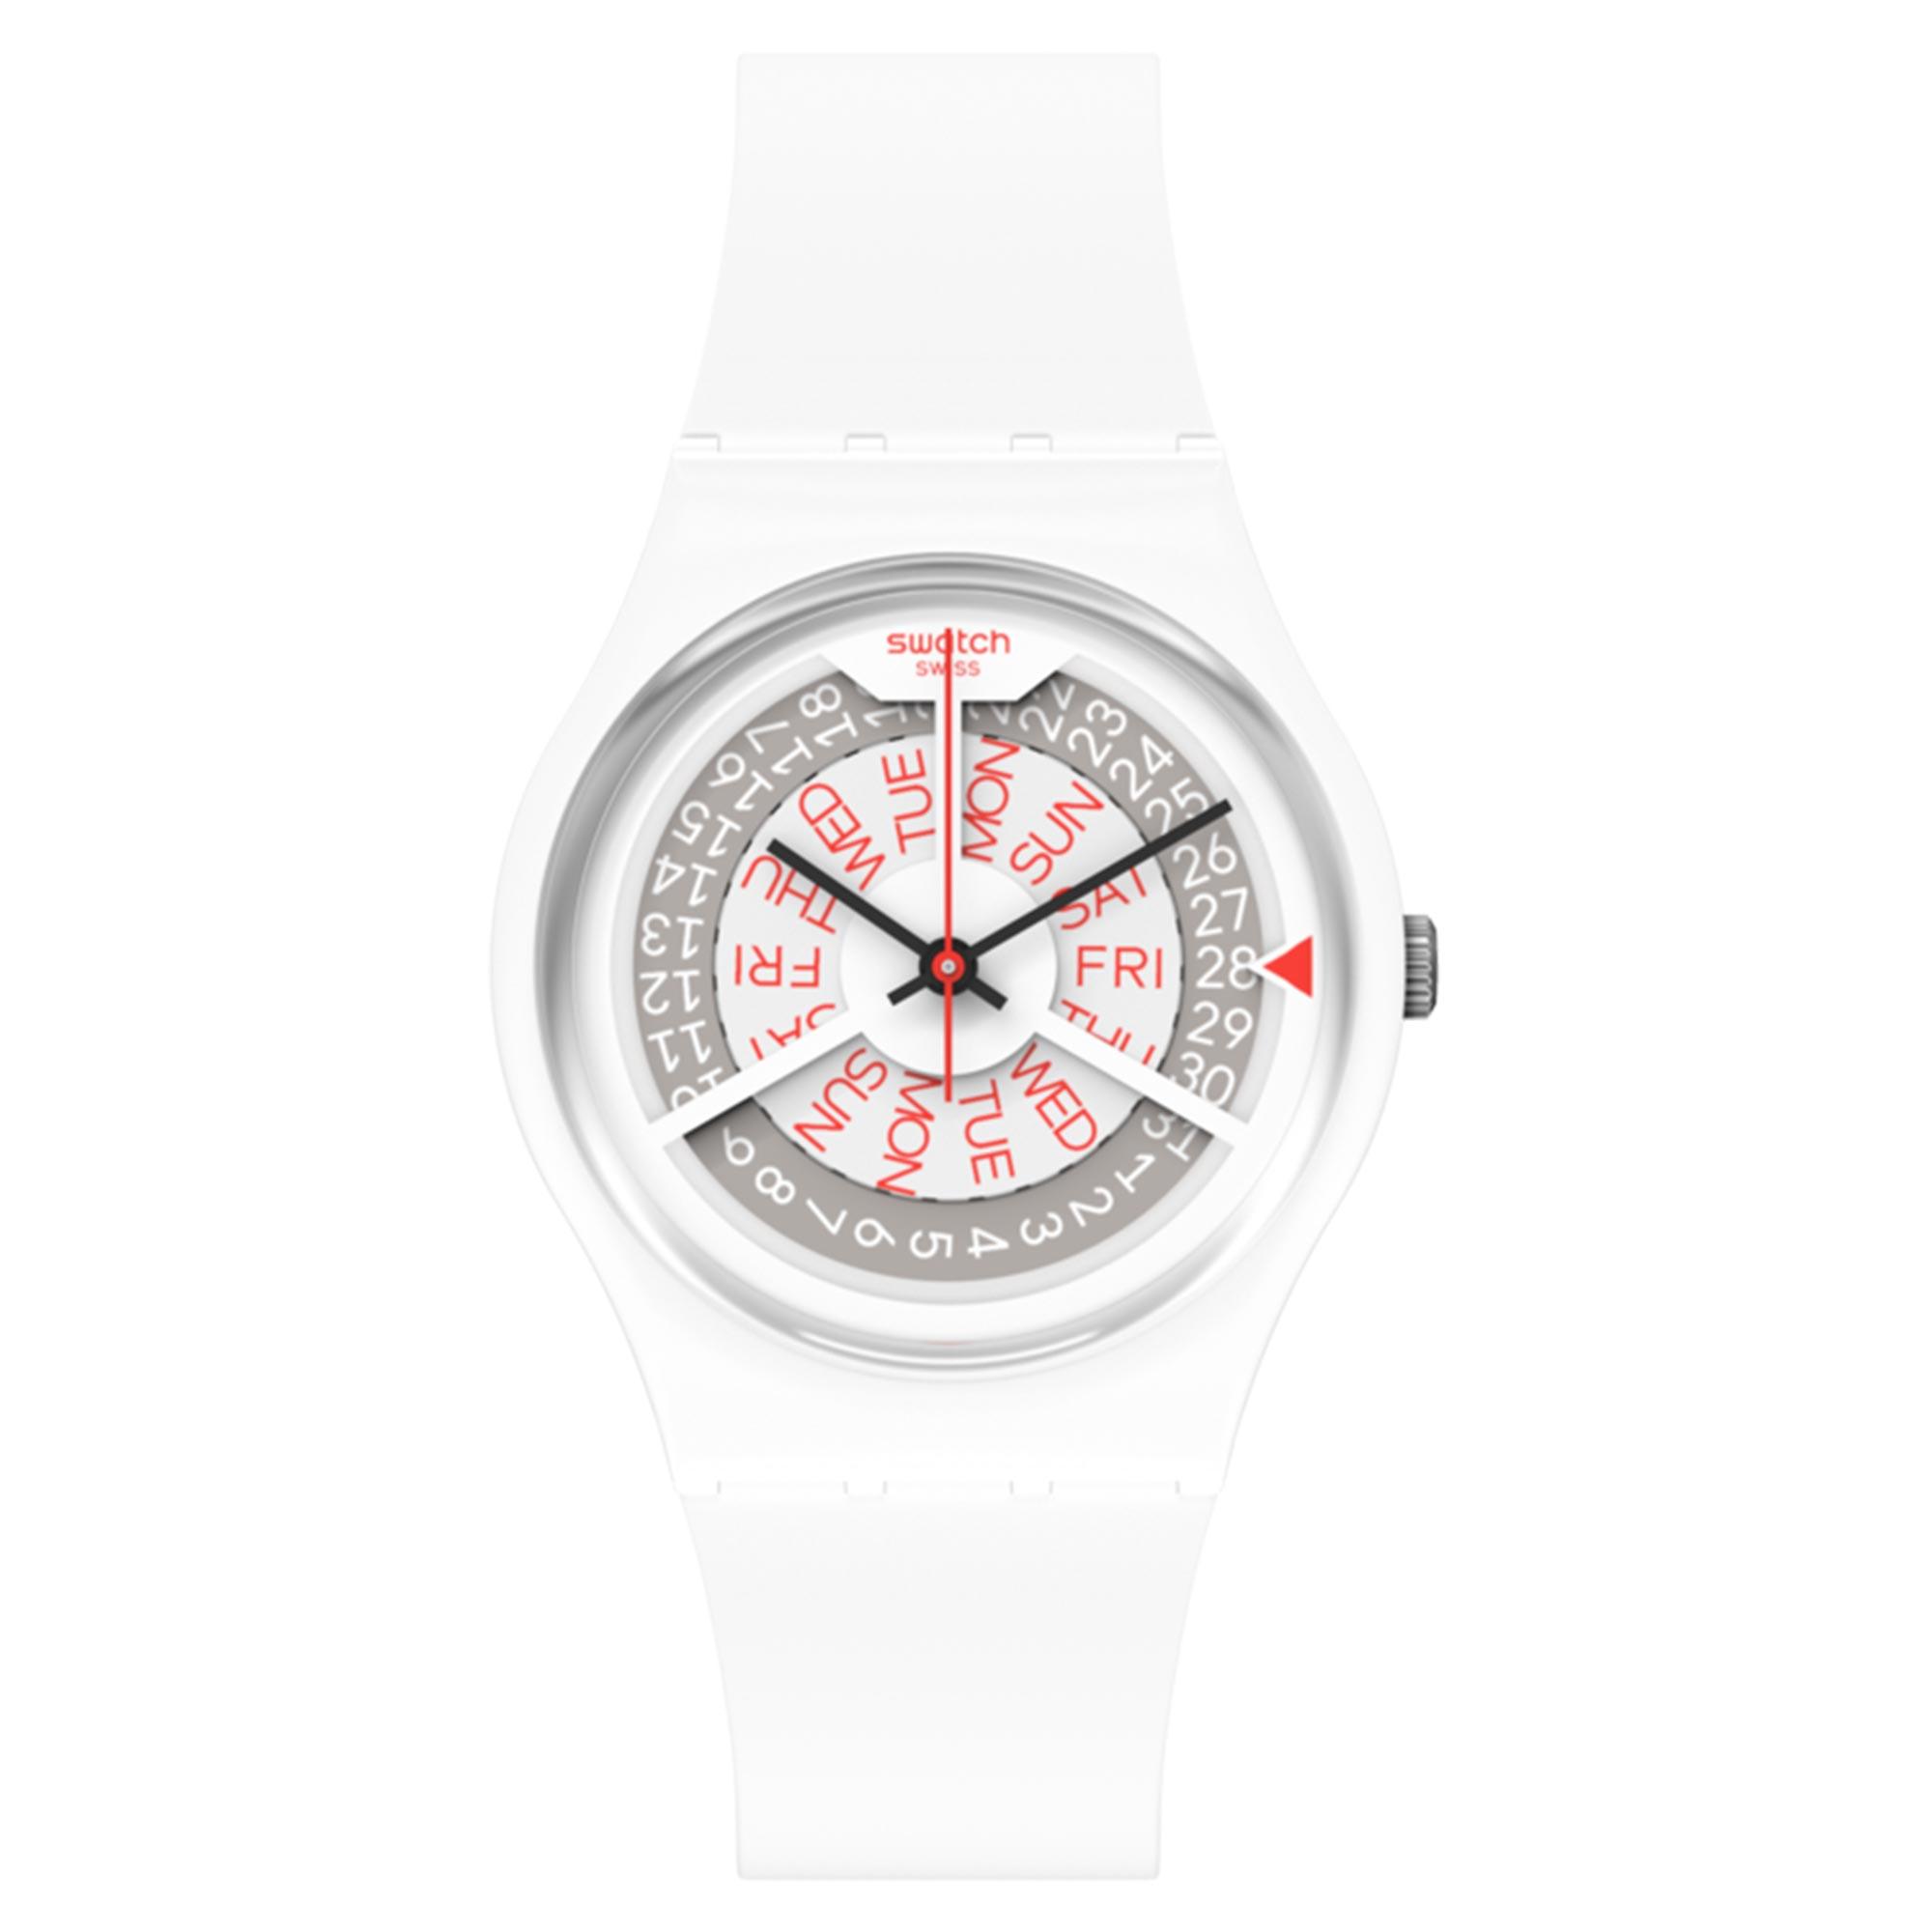 Swatch N-IGMA Quartz Movement White Dial Silicone Bracelet Mens Watch GW717